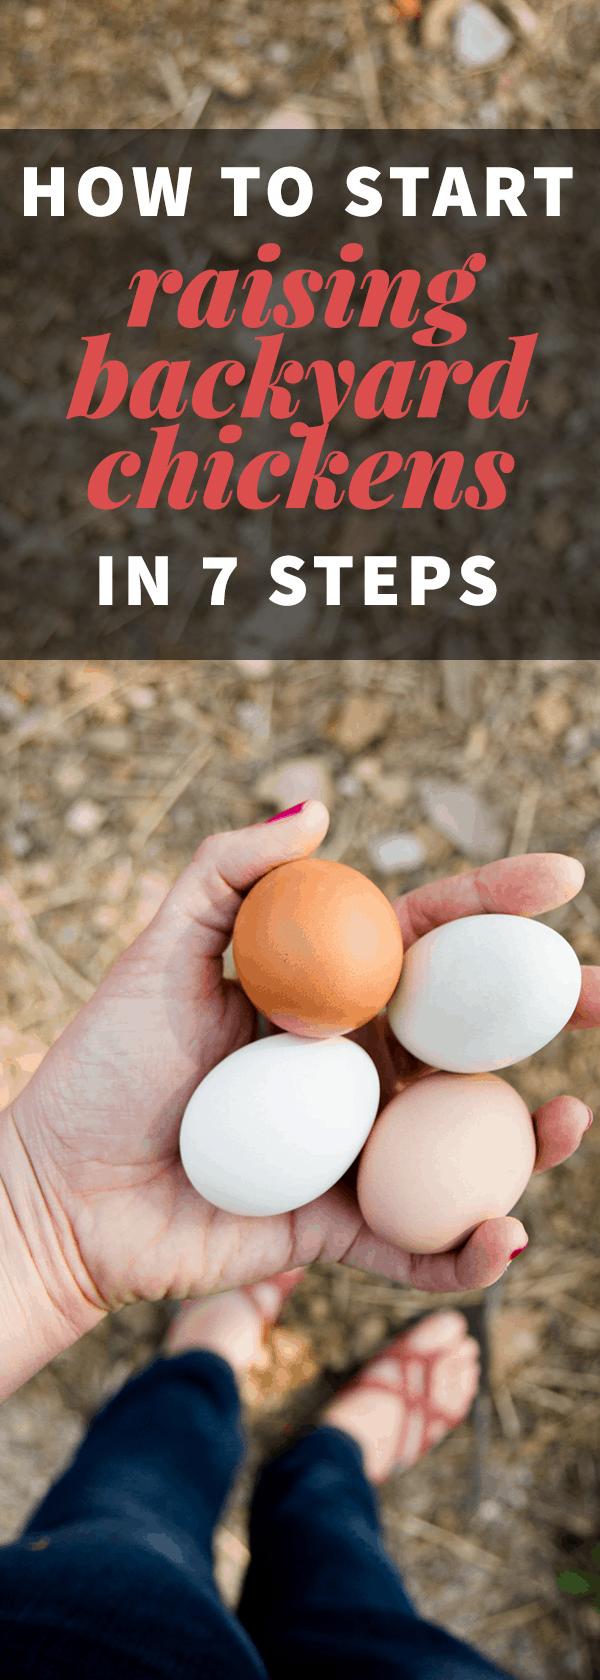 How to Start Raising Backyard Chickens in 7 Steps